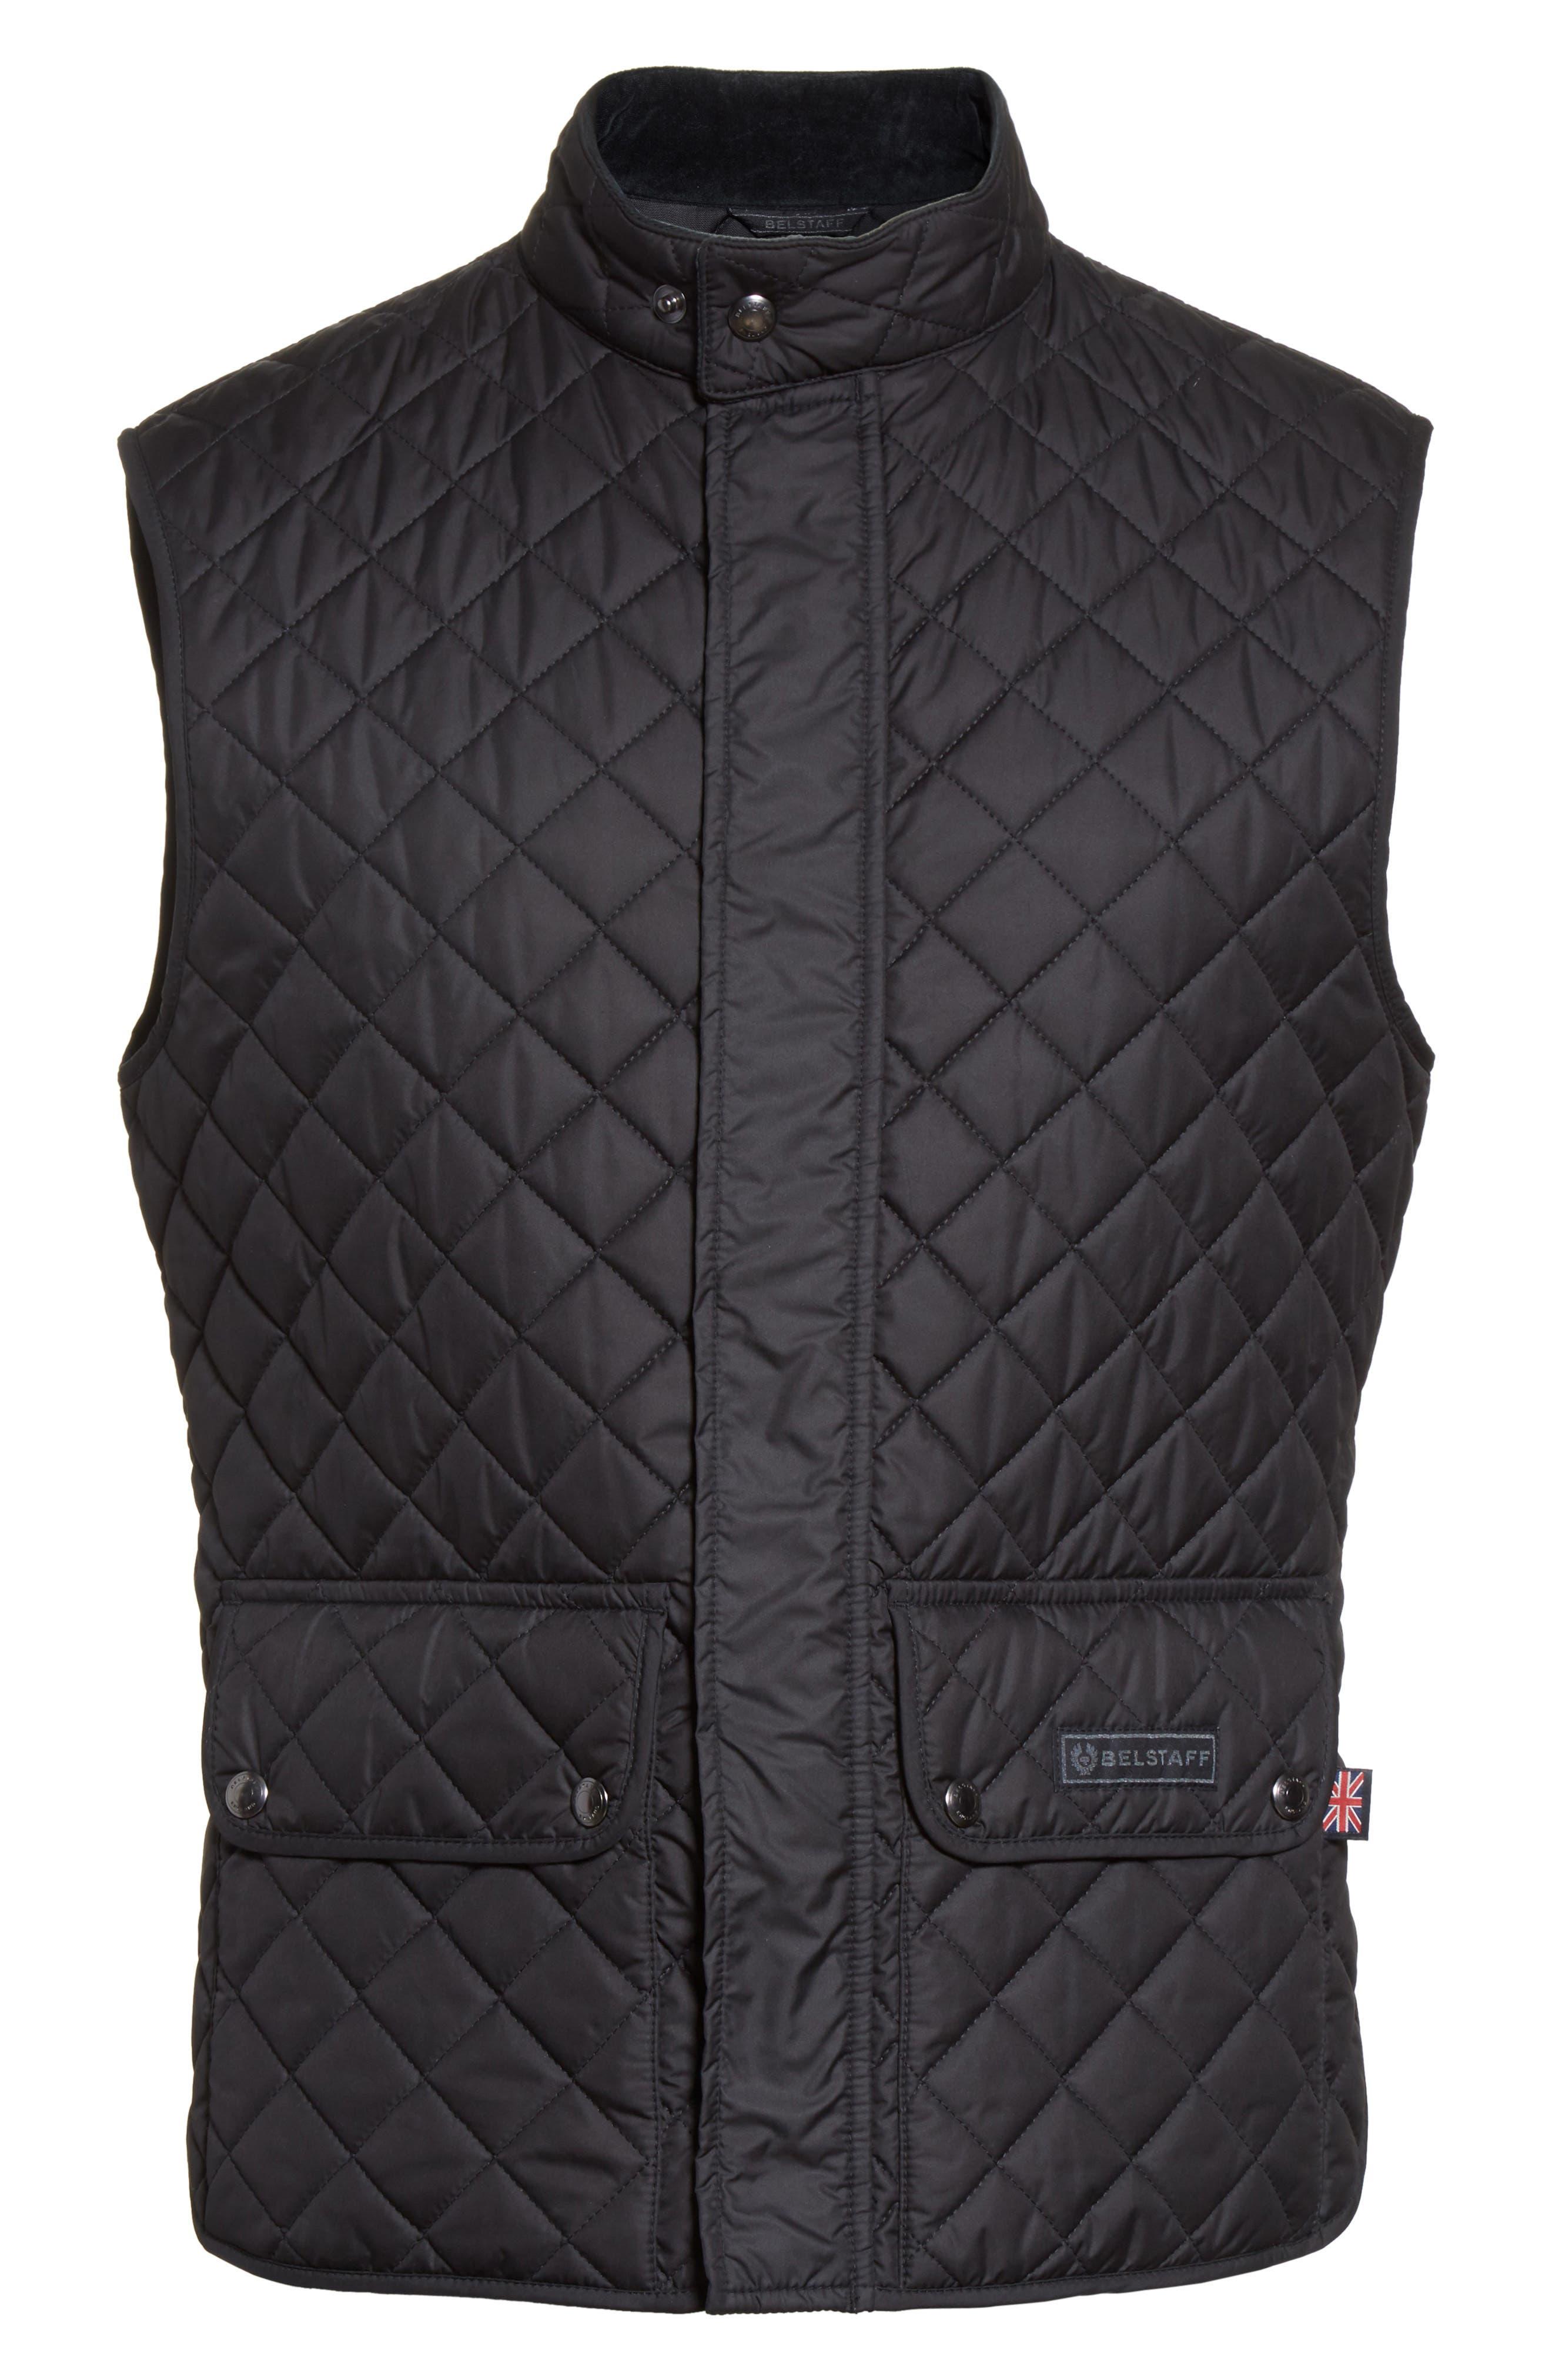 Waistcoat Tech Quilted Vest,                             Alternate thumbnail 6, color,                             Black